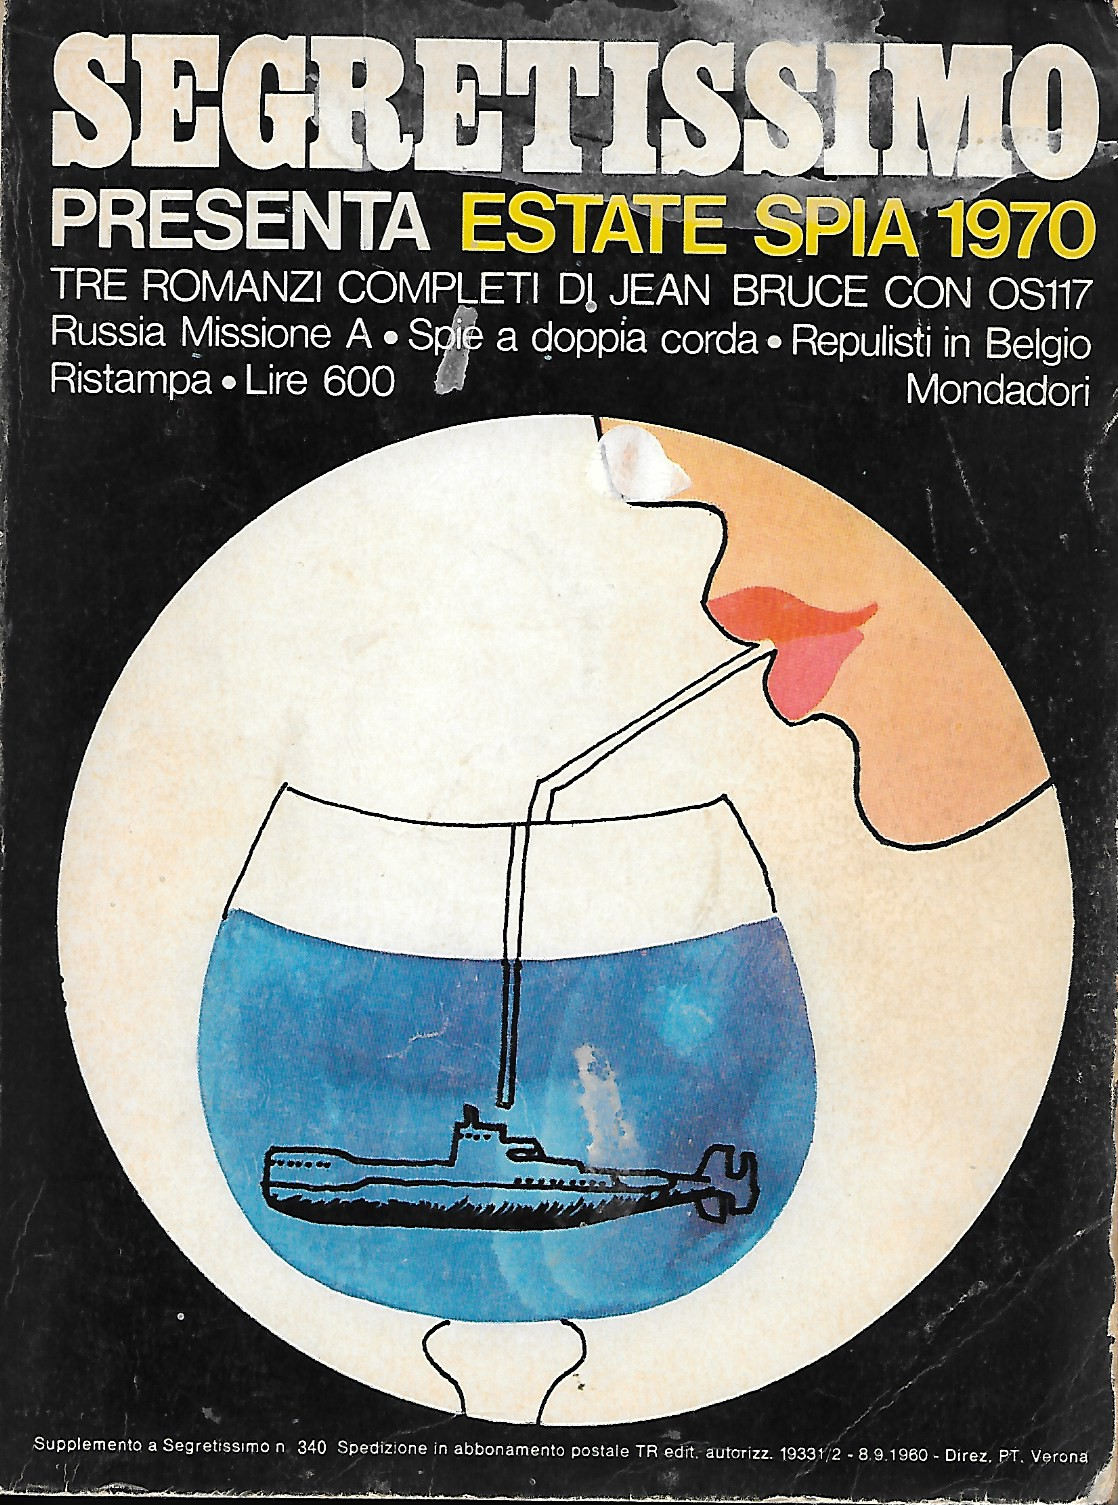 Segretissimo Estate spia 1970